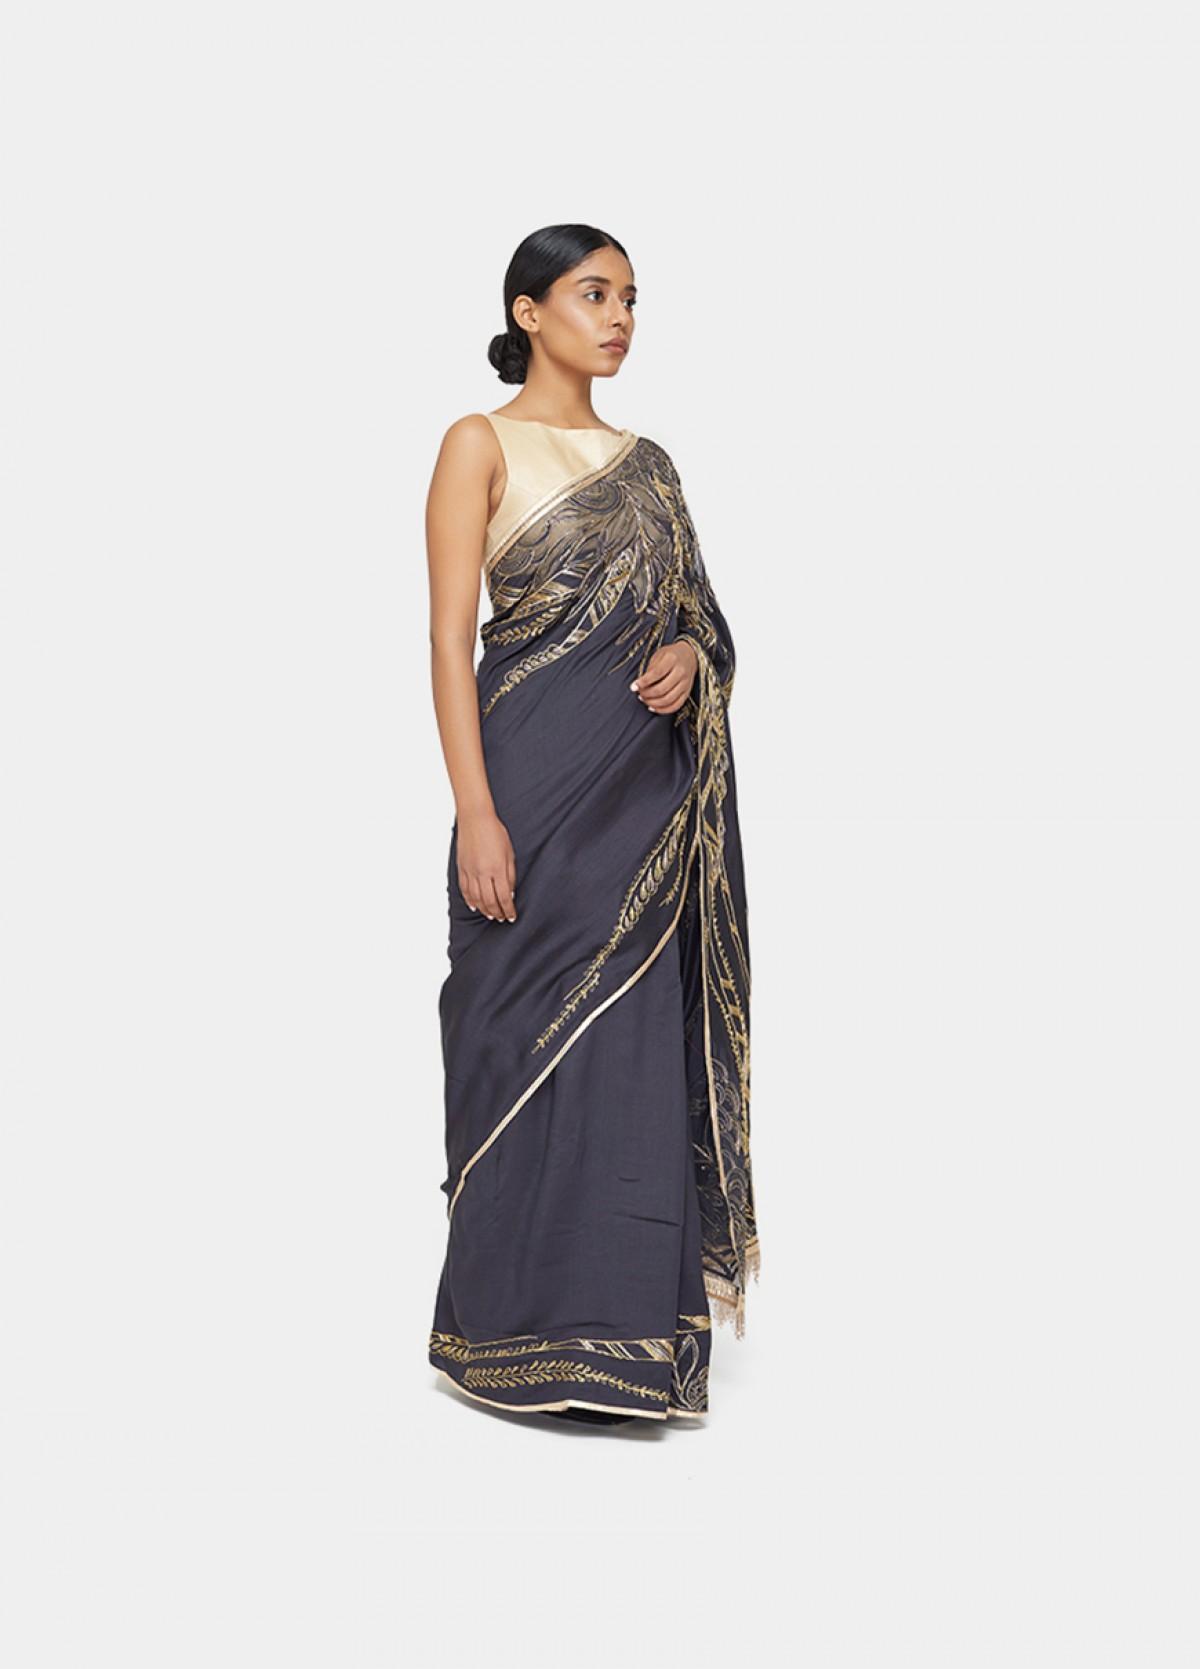 The Lehar Sari